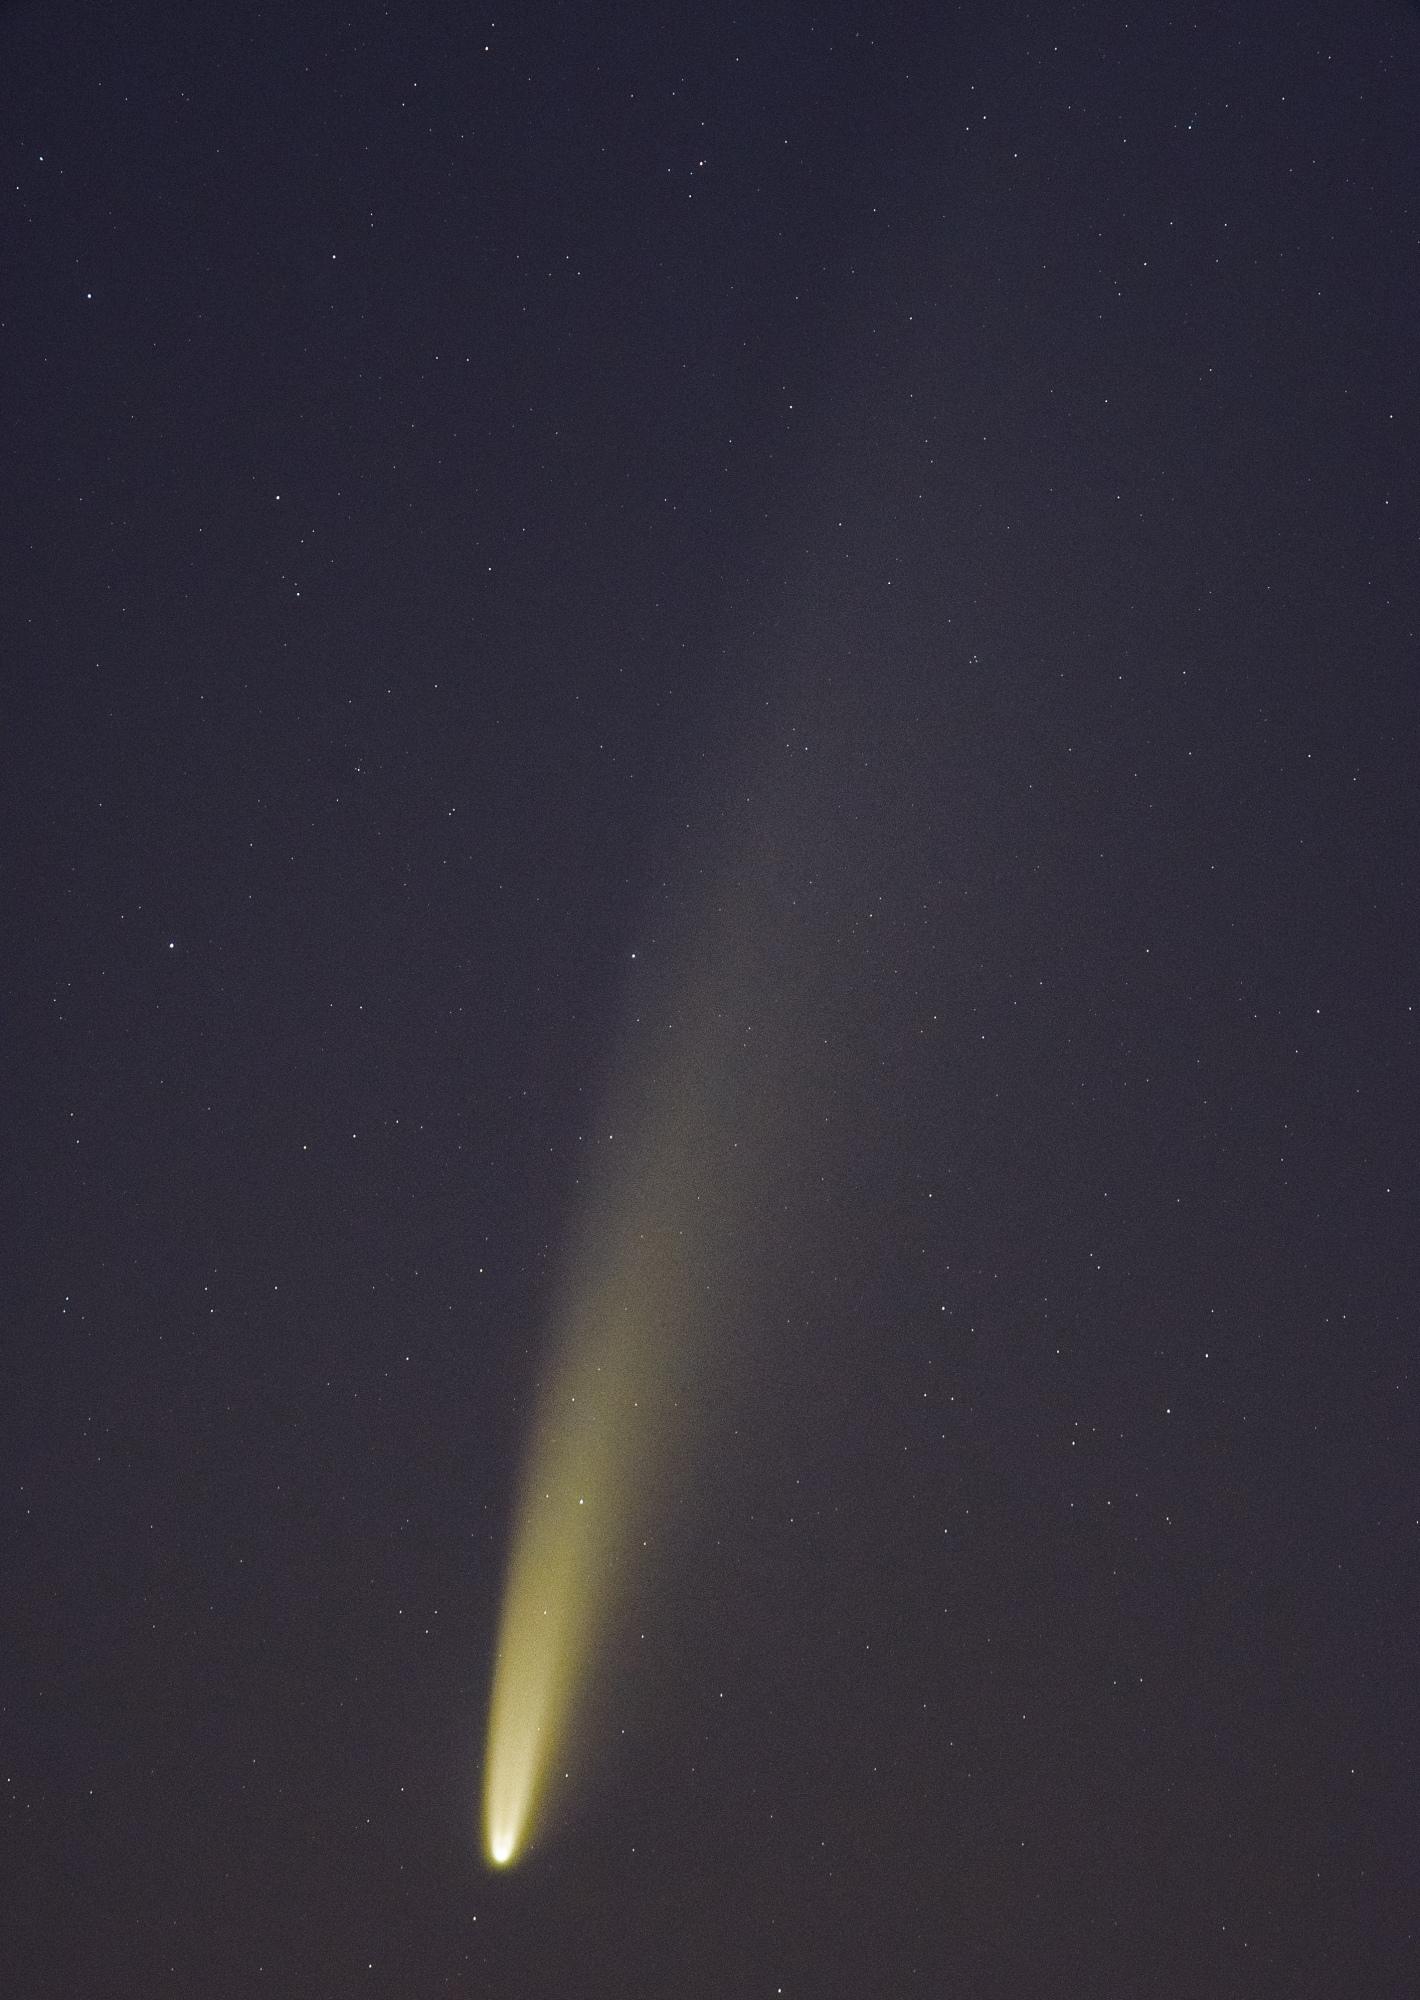 NEOWISE120720.jpg